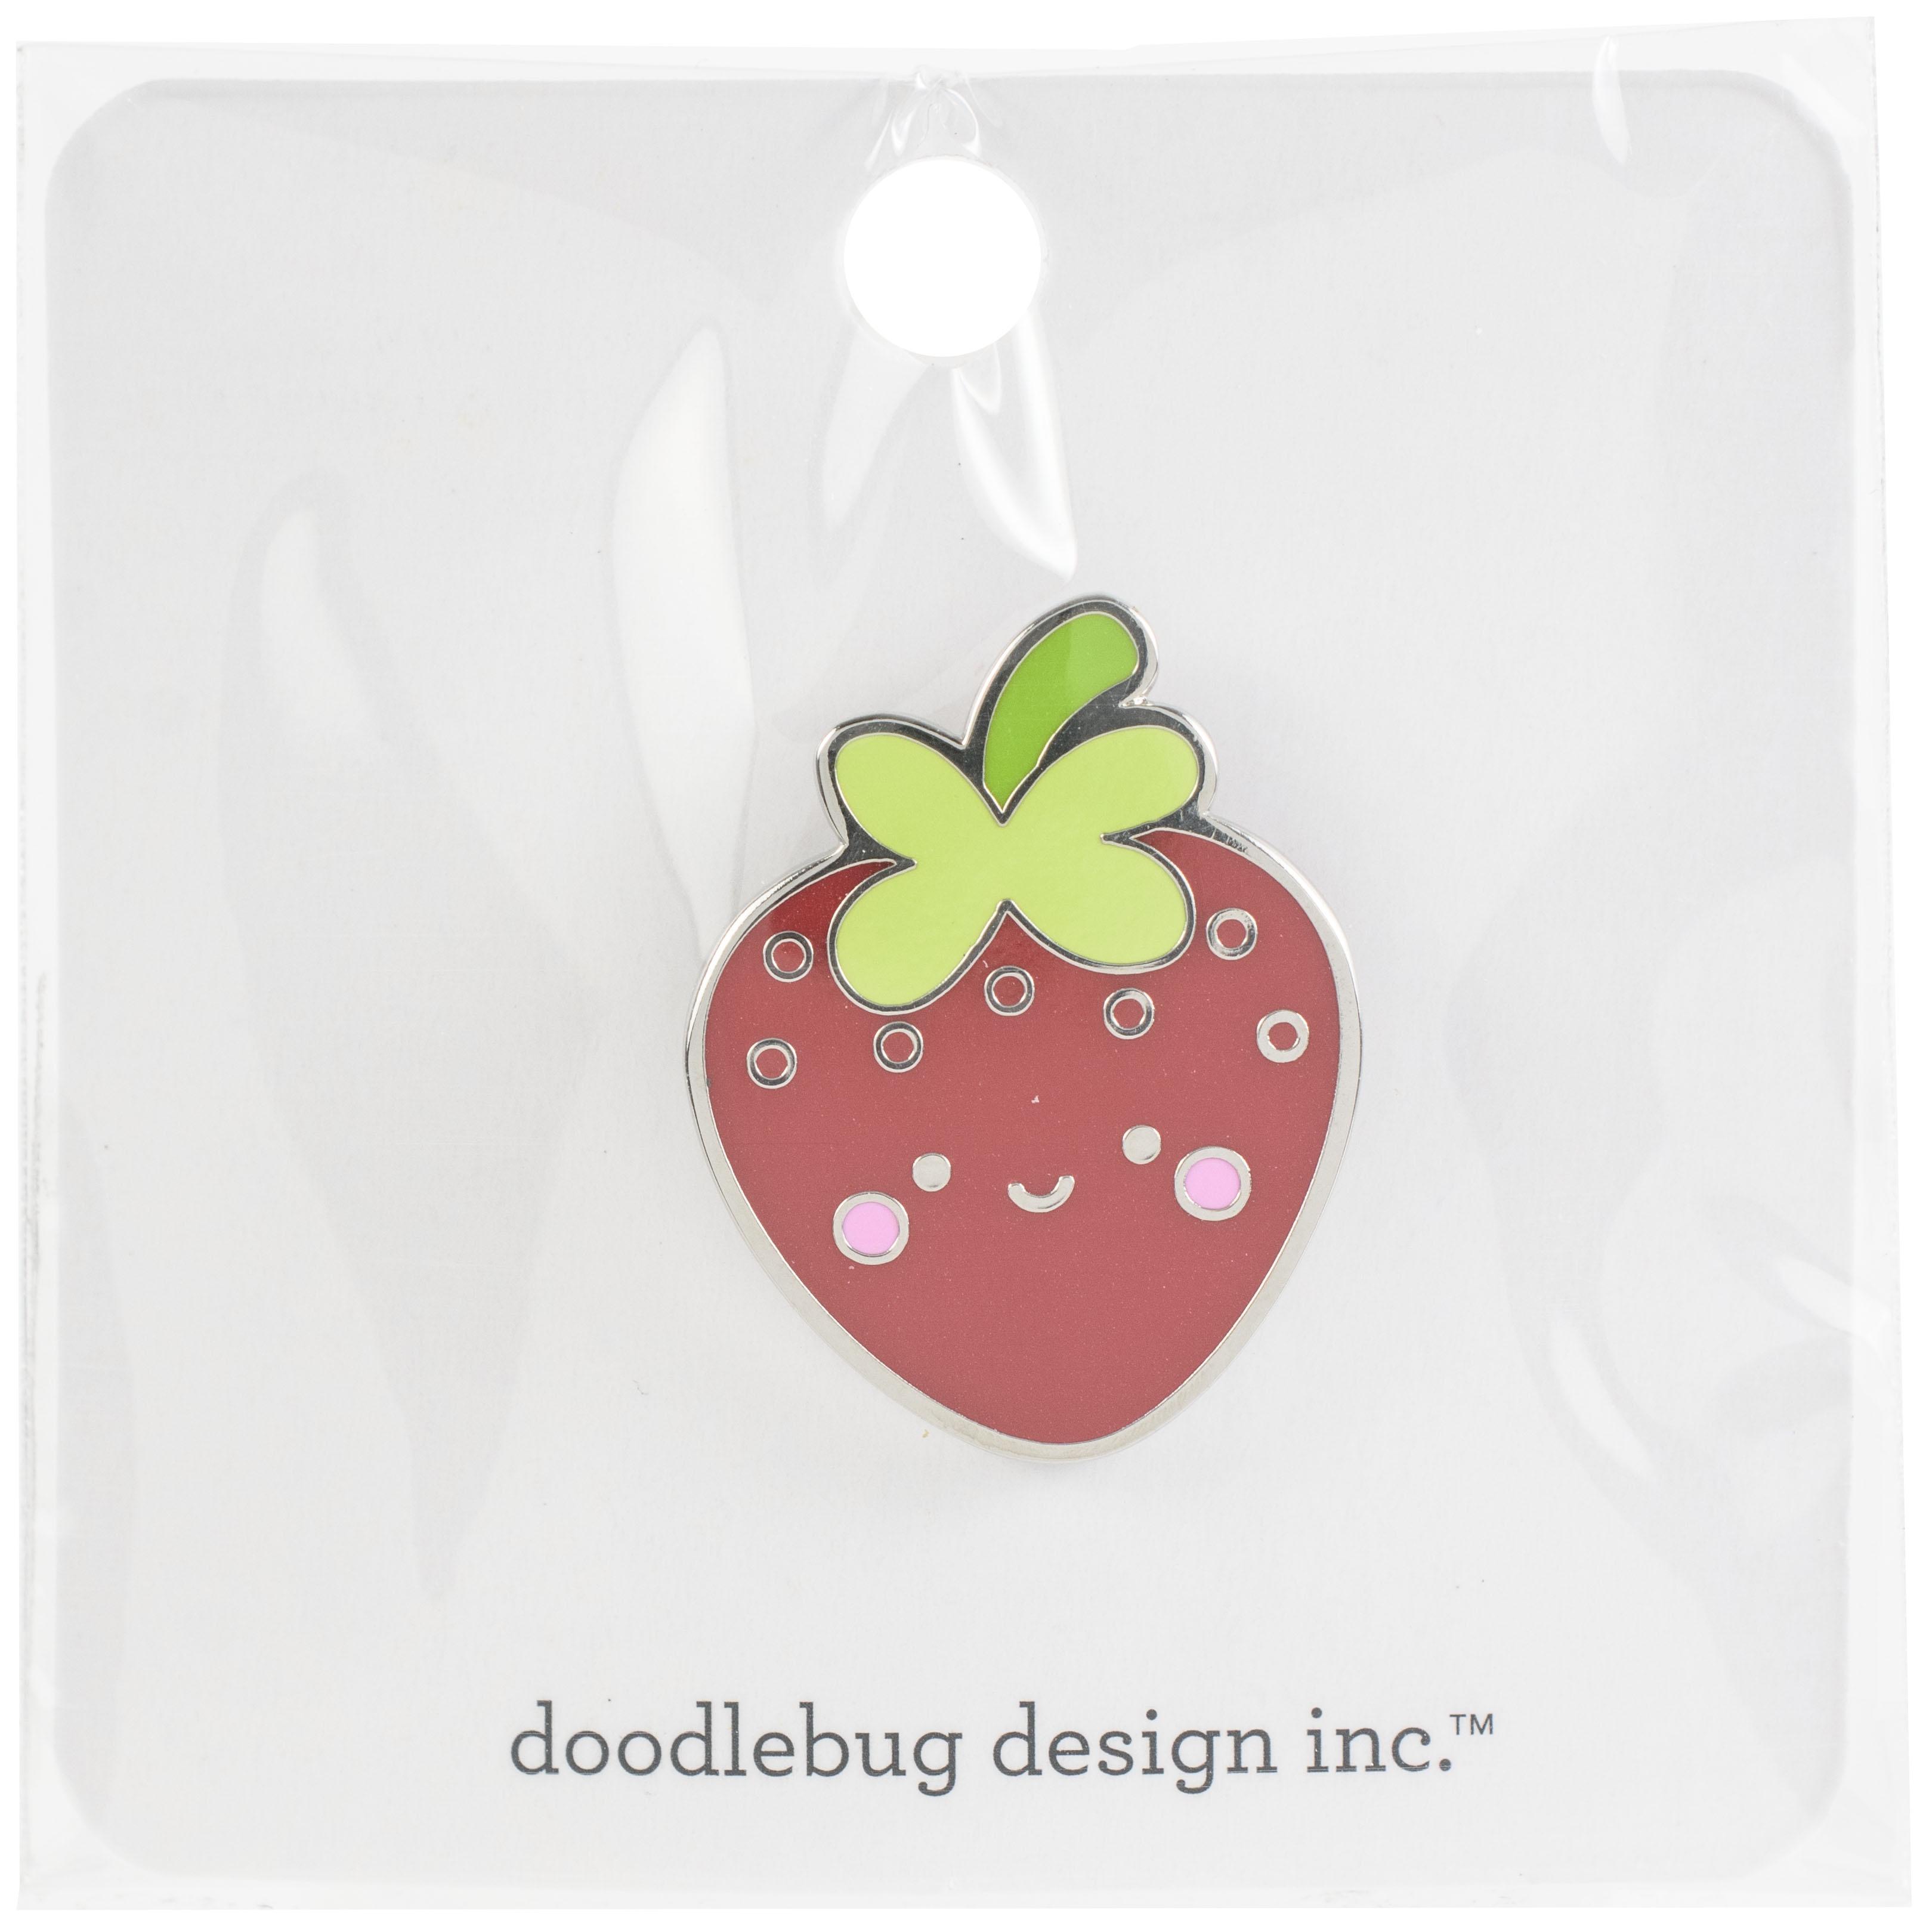 Doodlebug Collectible Enamel Pin - Berry Cute